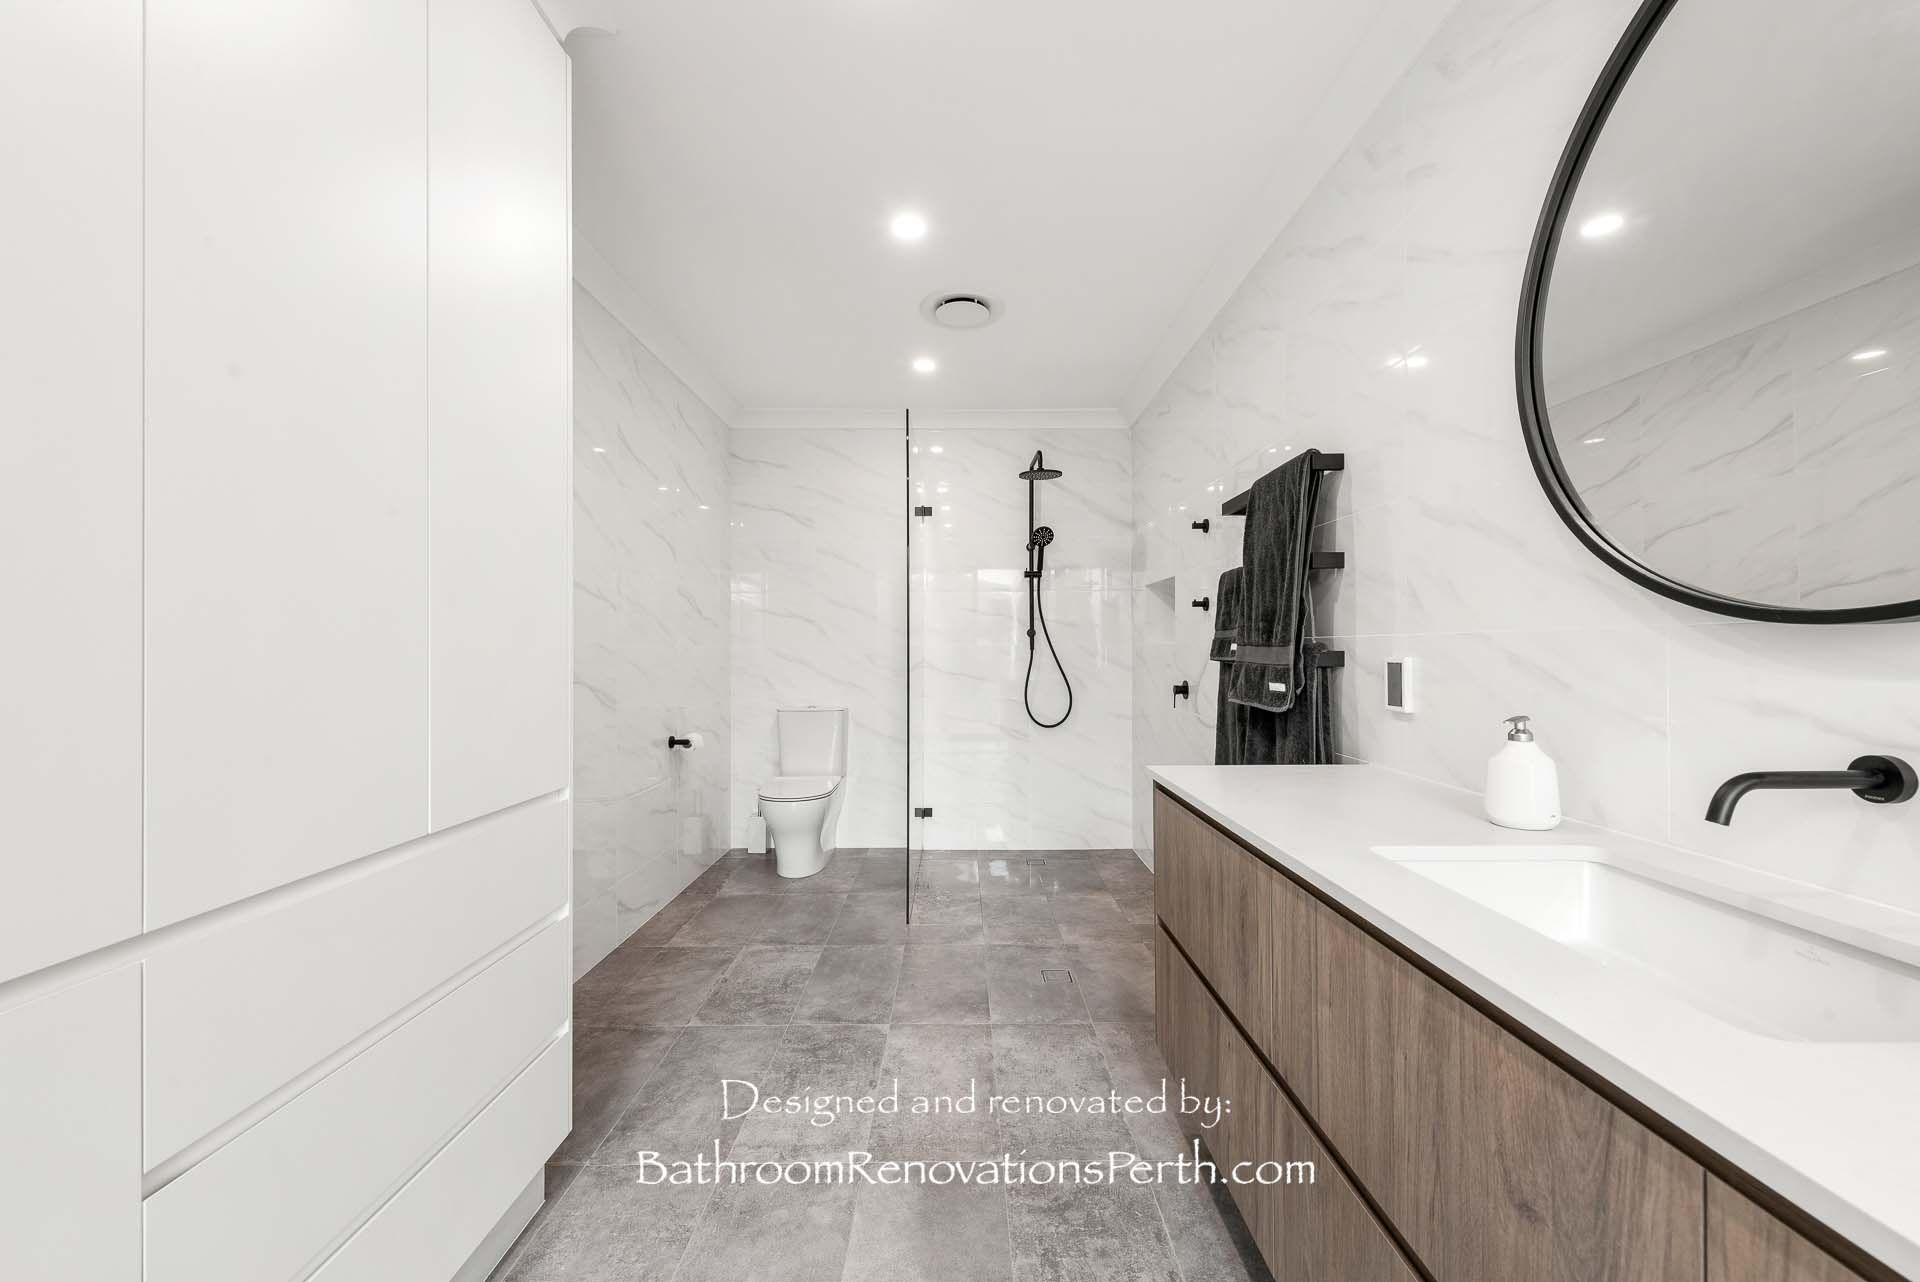 Gallery in 2020 bathroom renovations perth bathroom